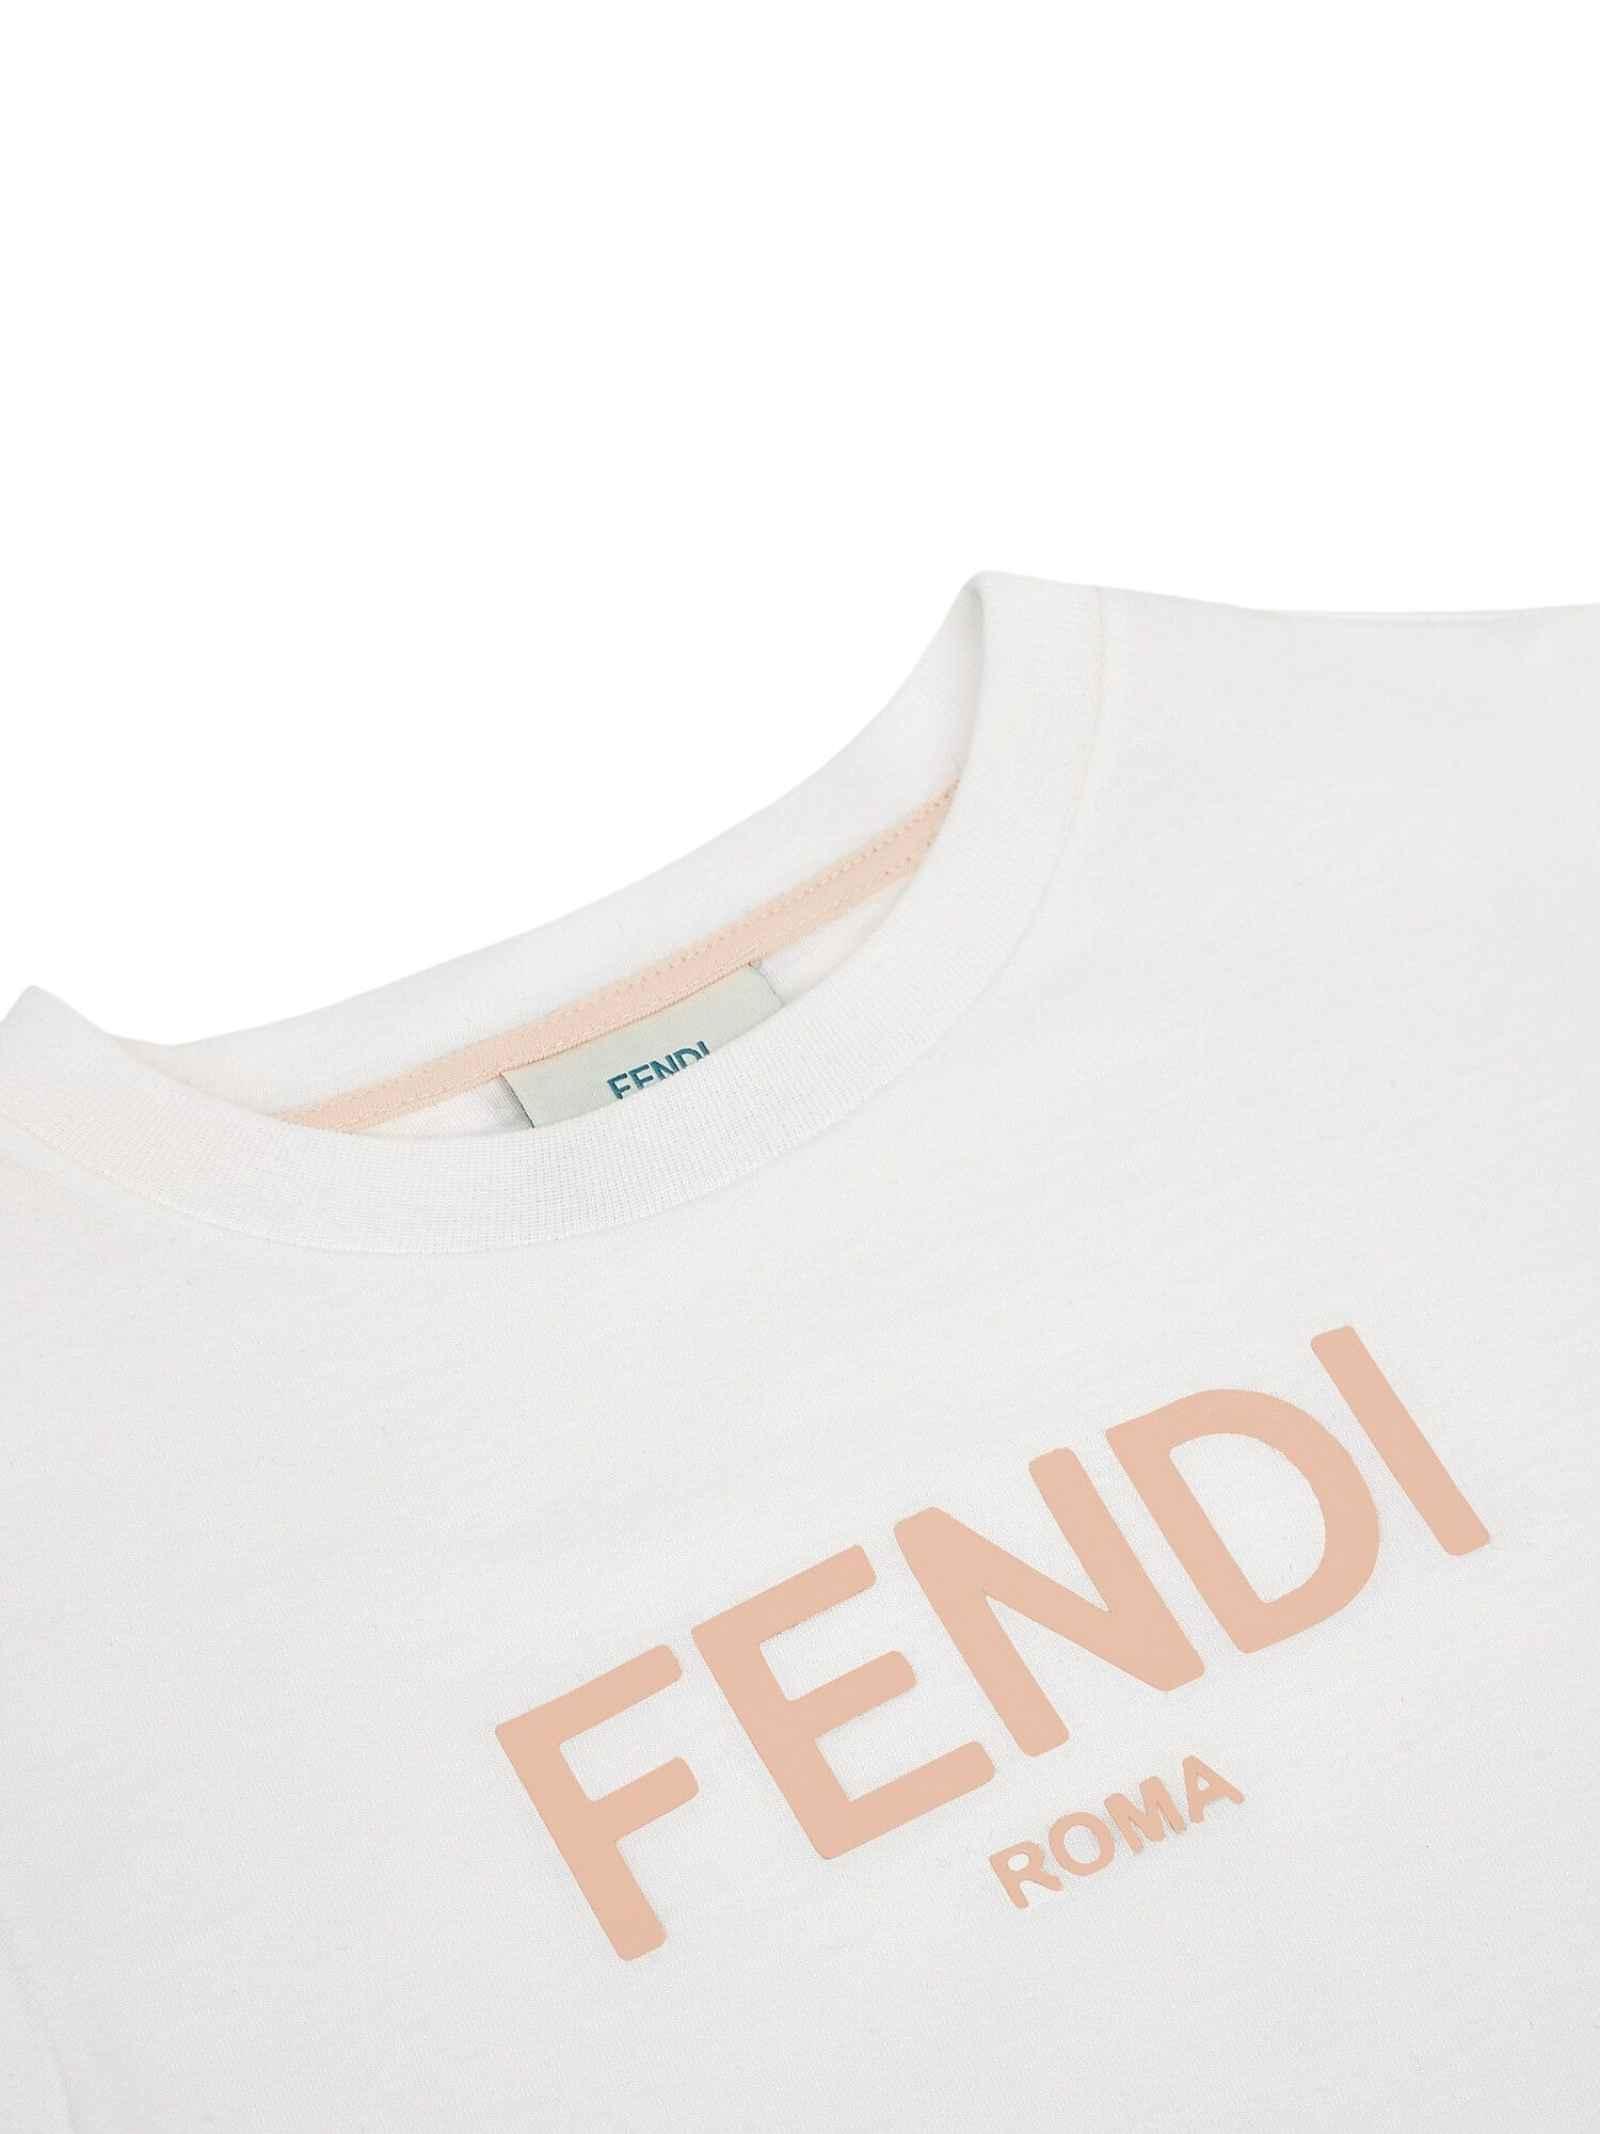 Fendi | T-shirt | JUI026 AEXLF0TX3